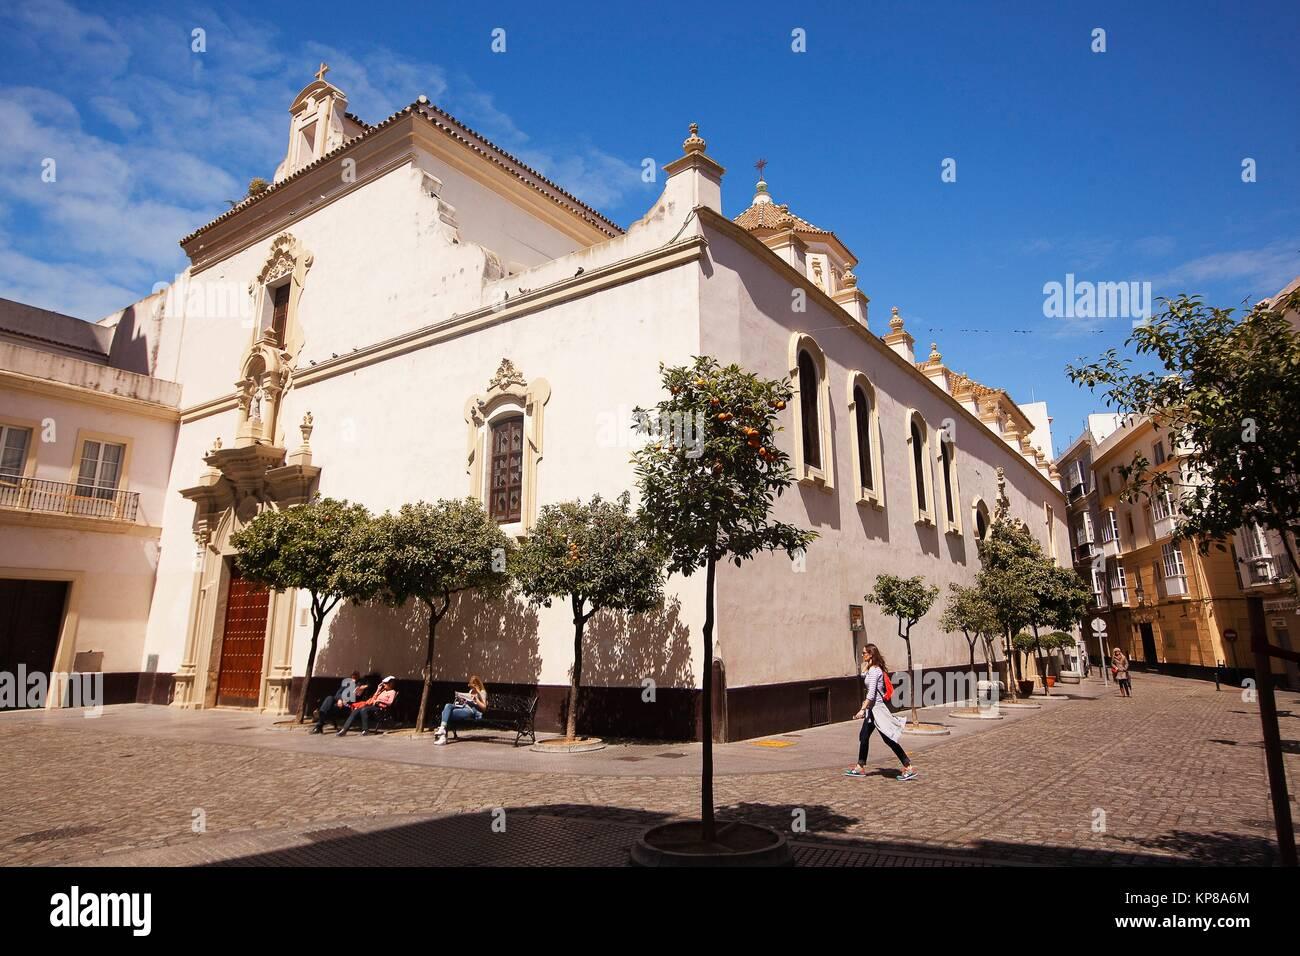 View to the Cristo De La Veracruz church, Cadiz City, Atlantic Ocean, Andalusia, Spain, Europe. - Stock Image